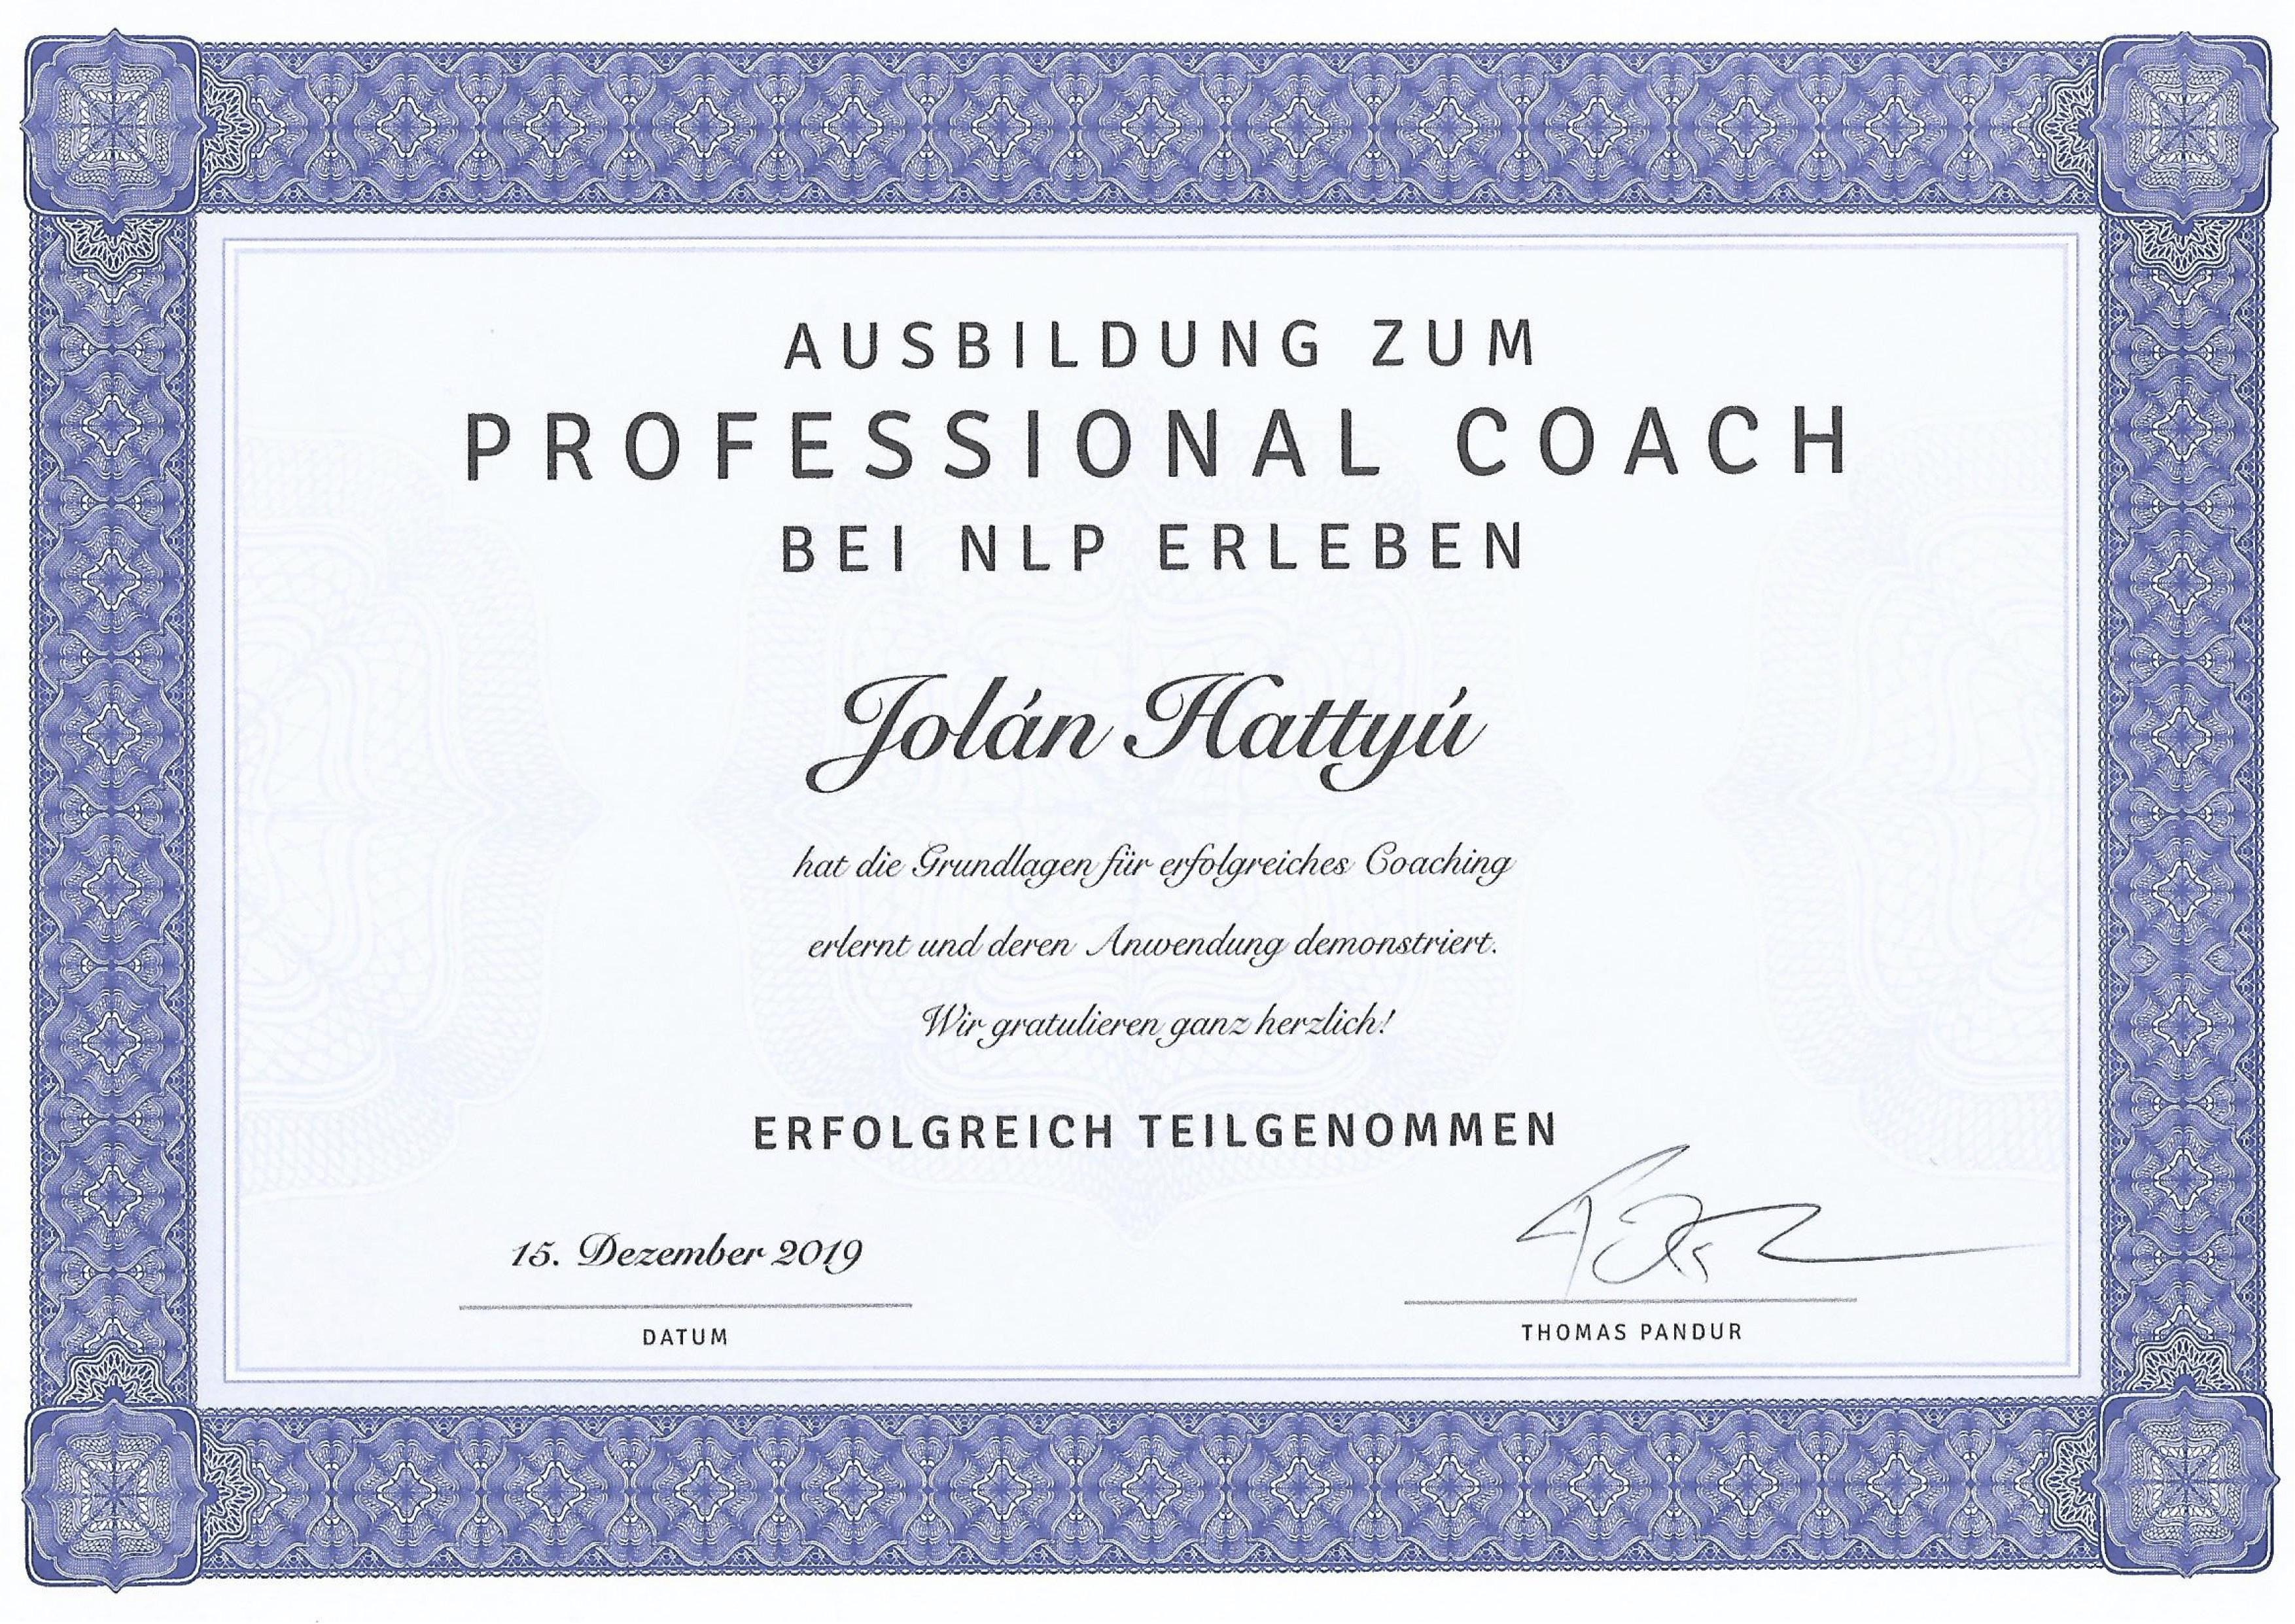 Jolán Hattyú Professional Coach Zertifikat